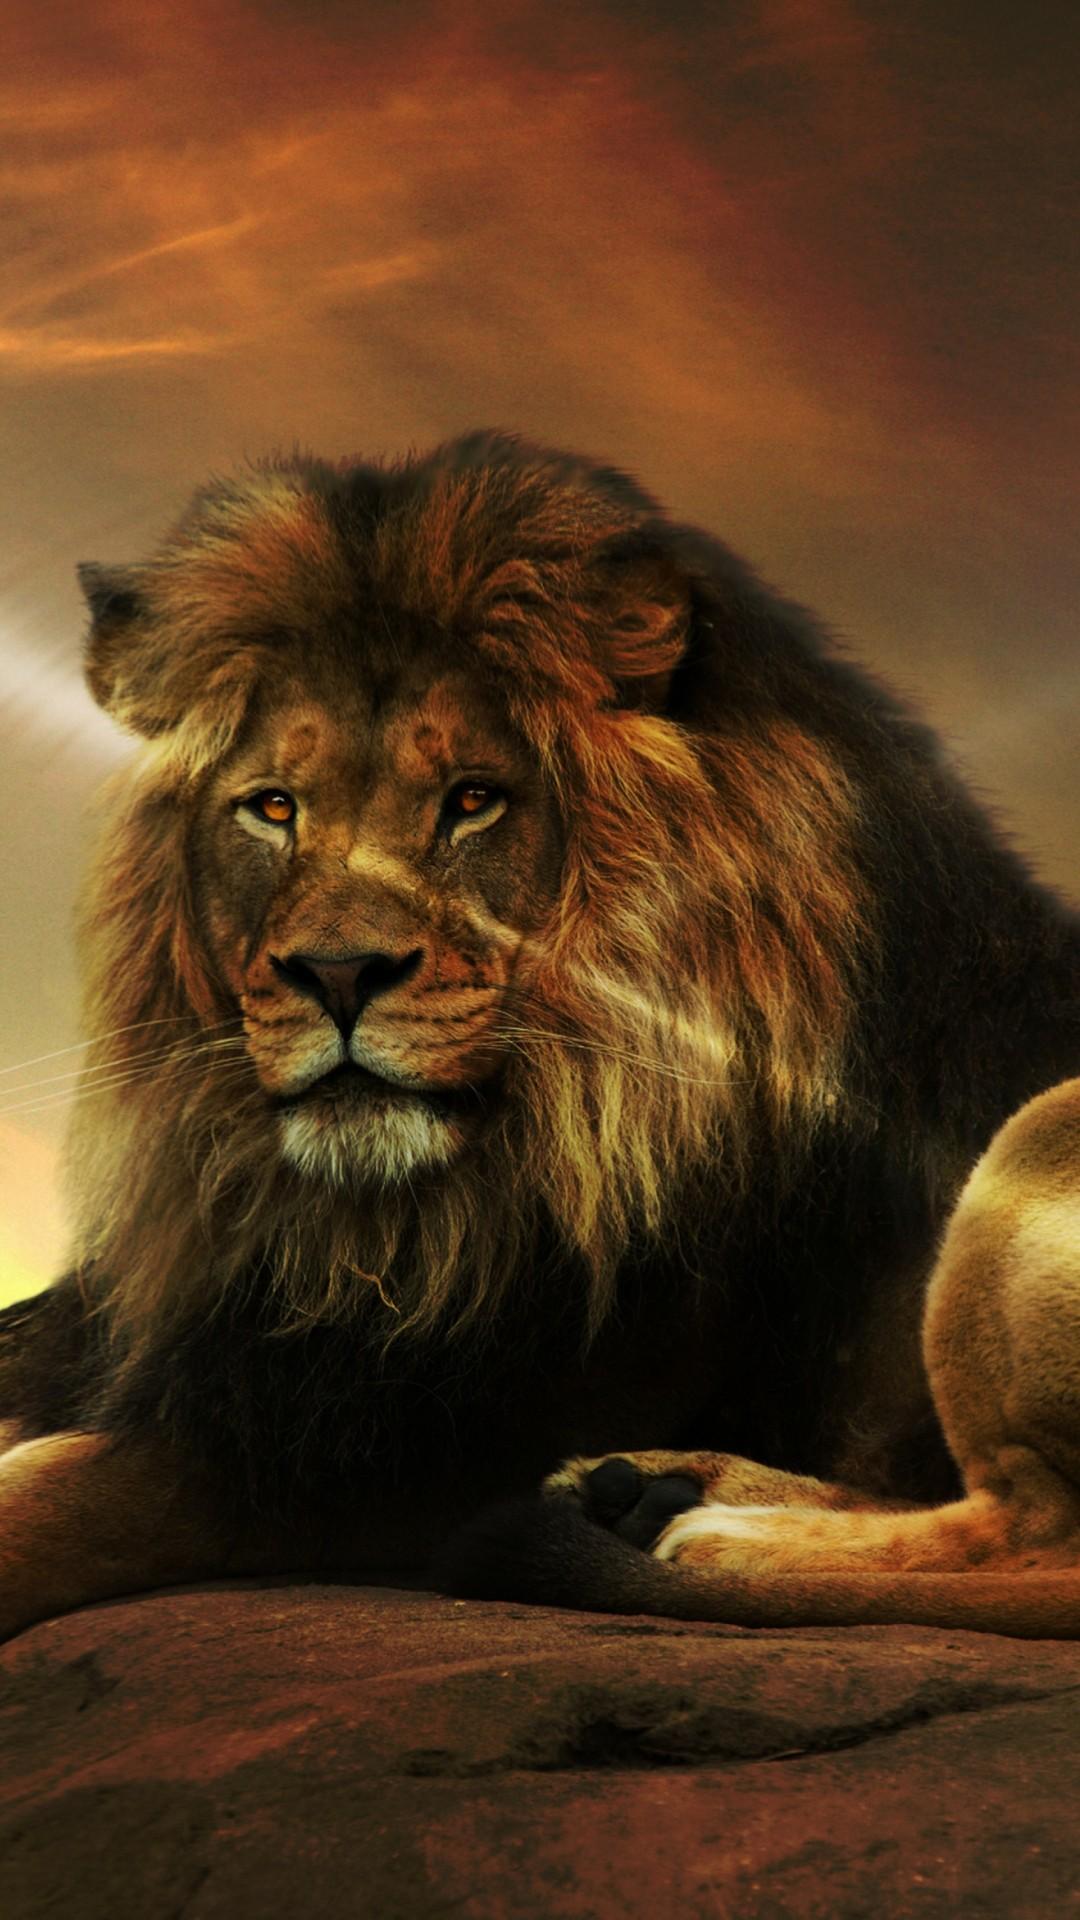 Lion iPhone 6 wallpaper